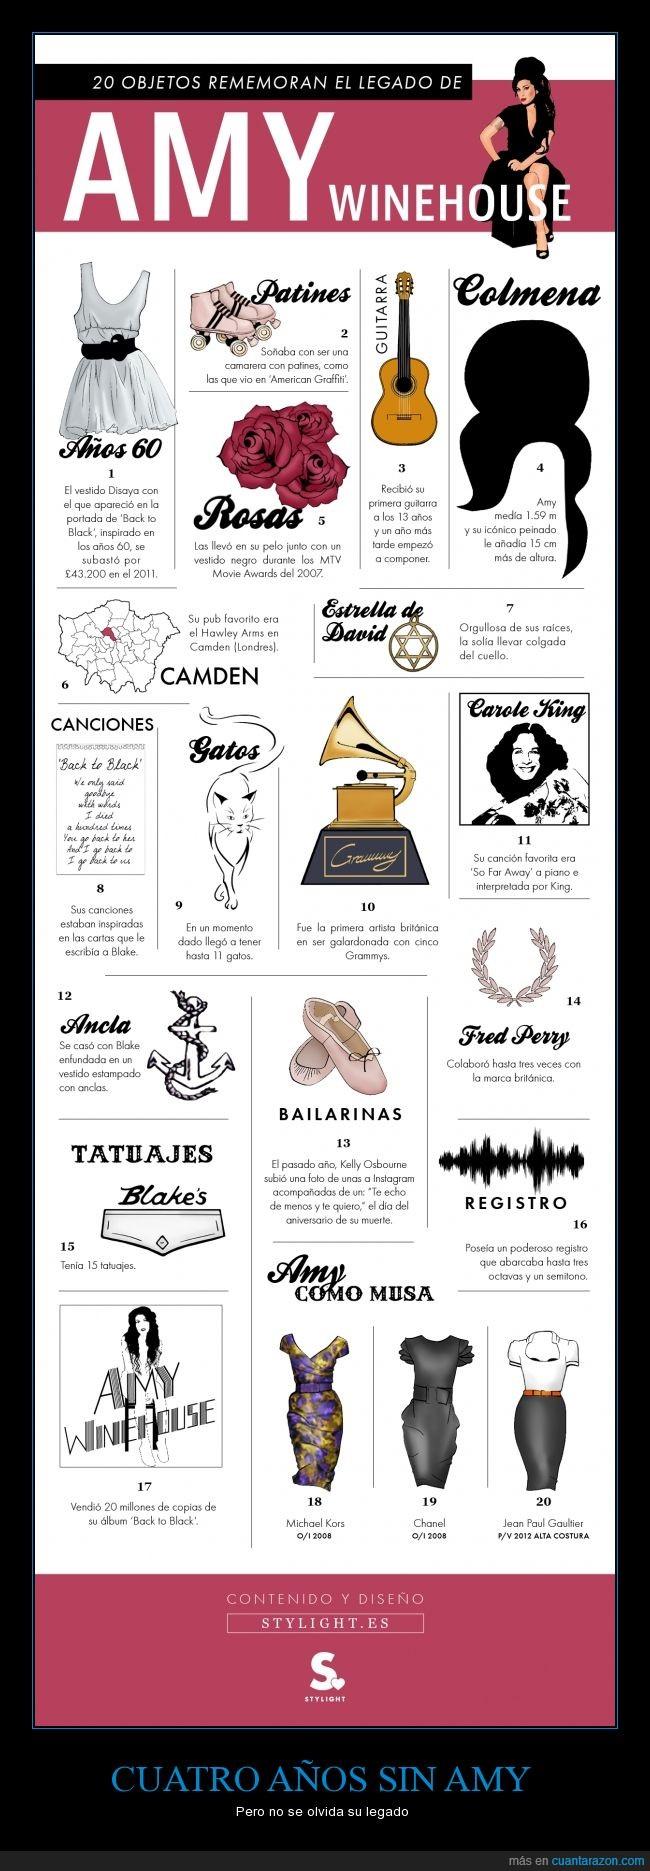 Amy Winehouse,aniversario,estilo,legado,muerte,peinado,ropa,wemissyouamy